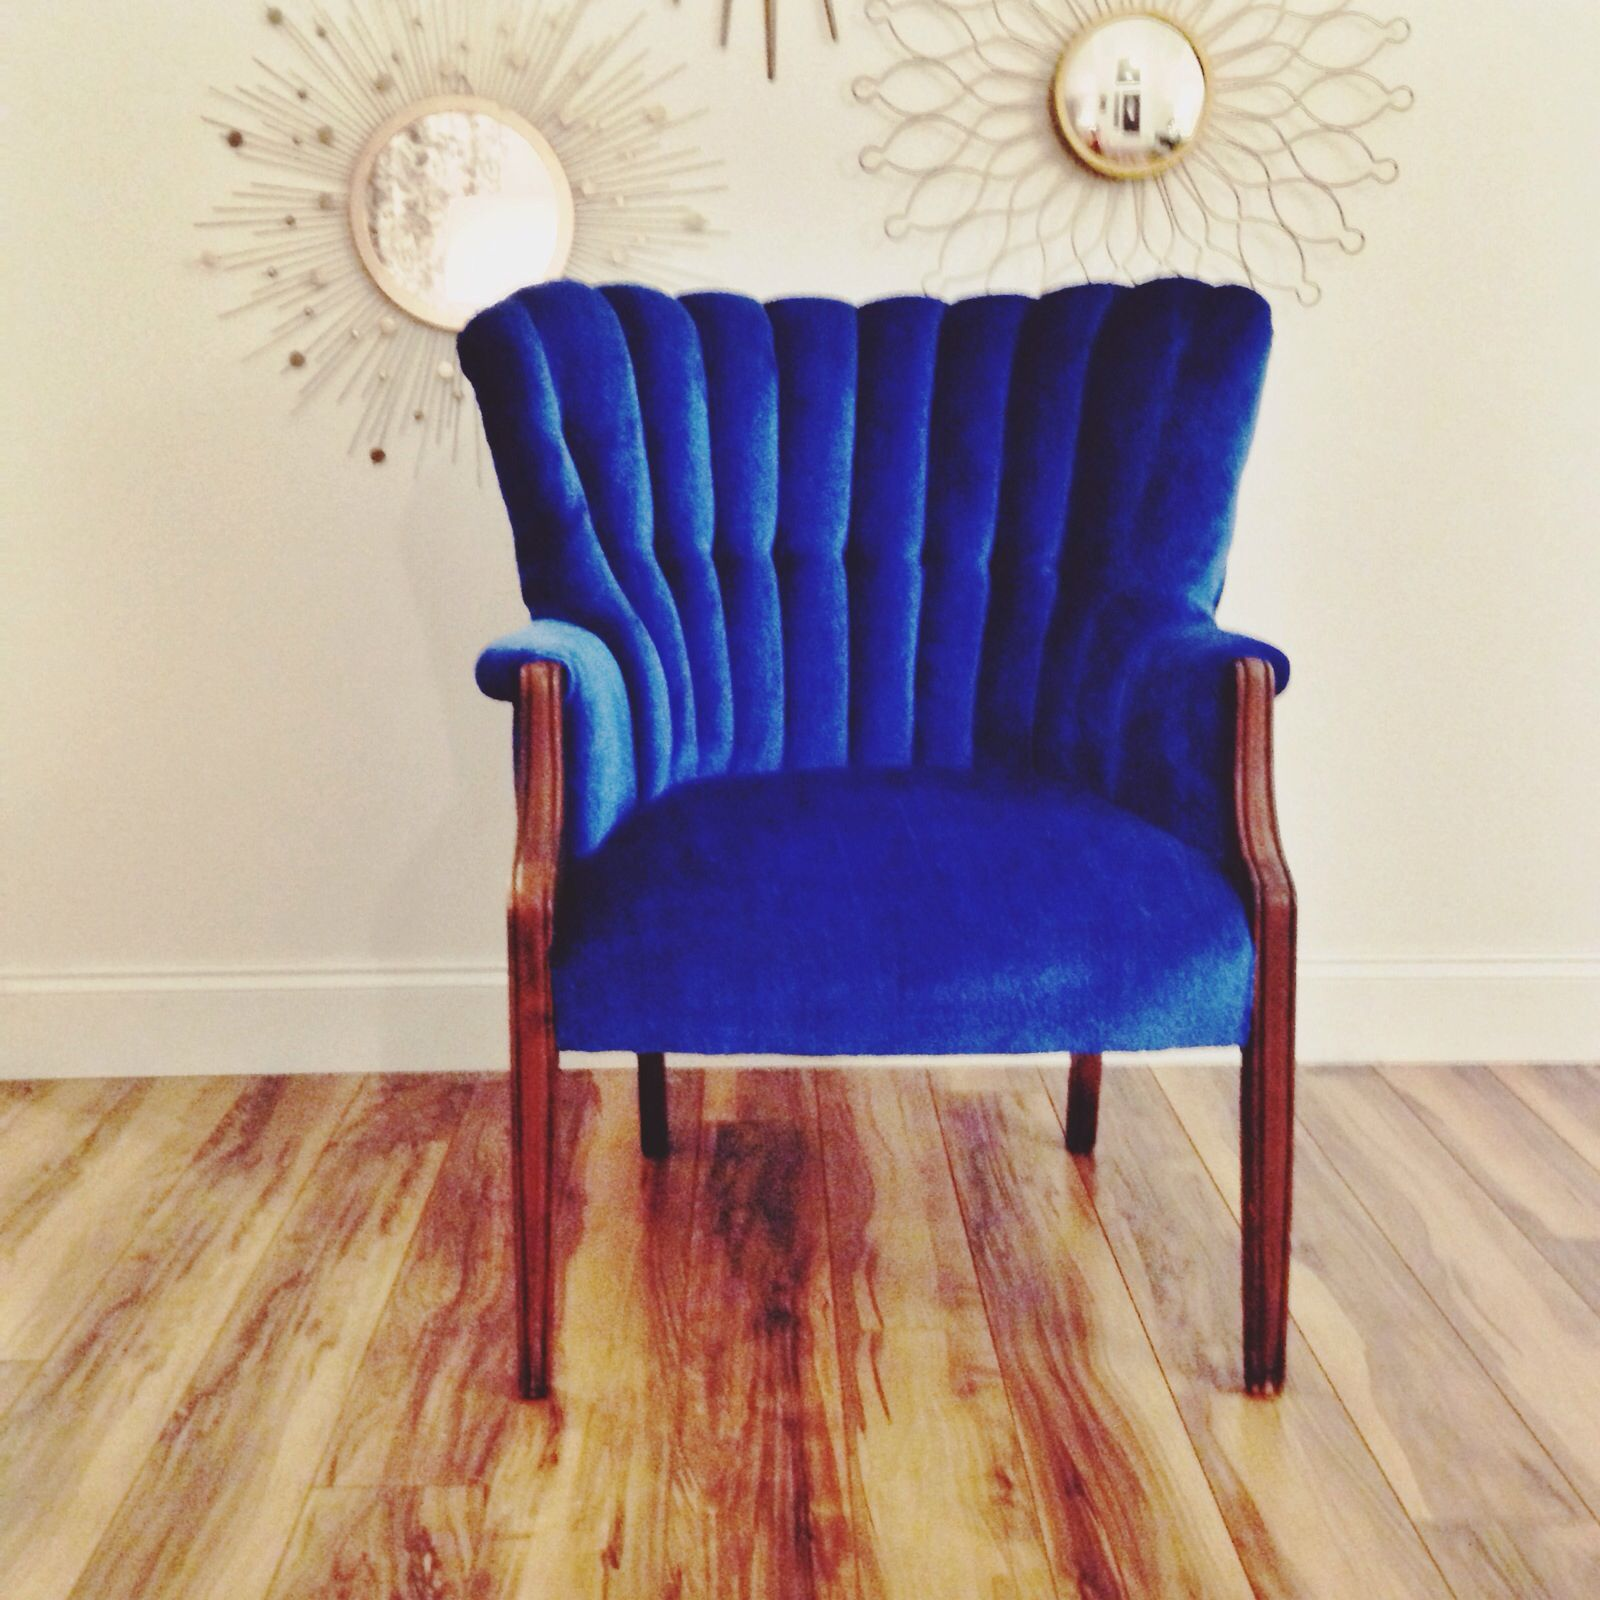 Electric Blue Chair Craigslist Find For 65 Chair Blue Chair